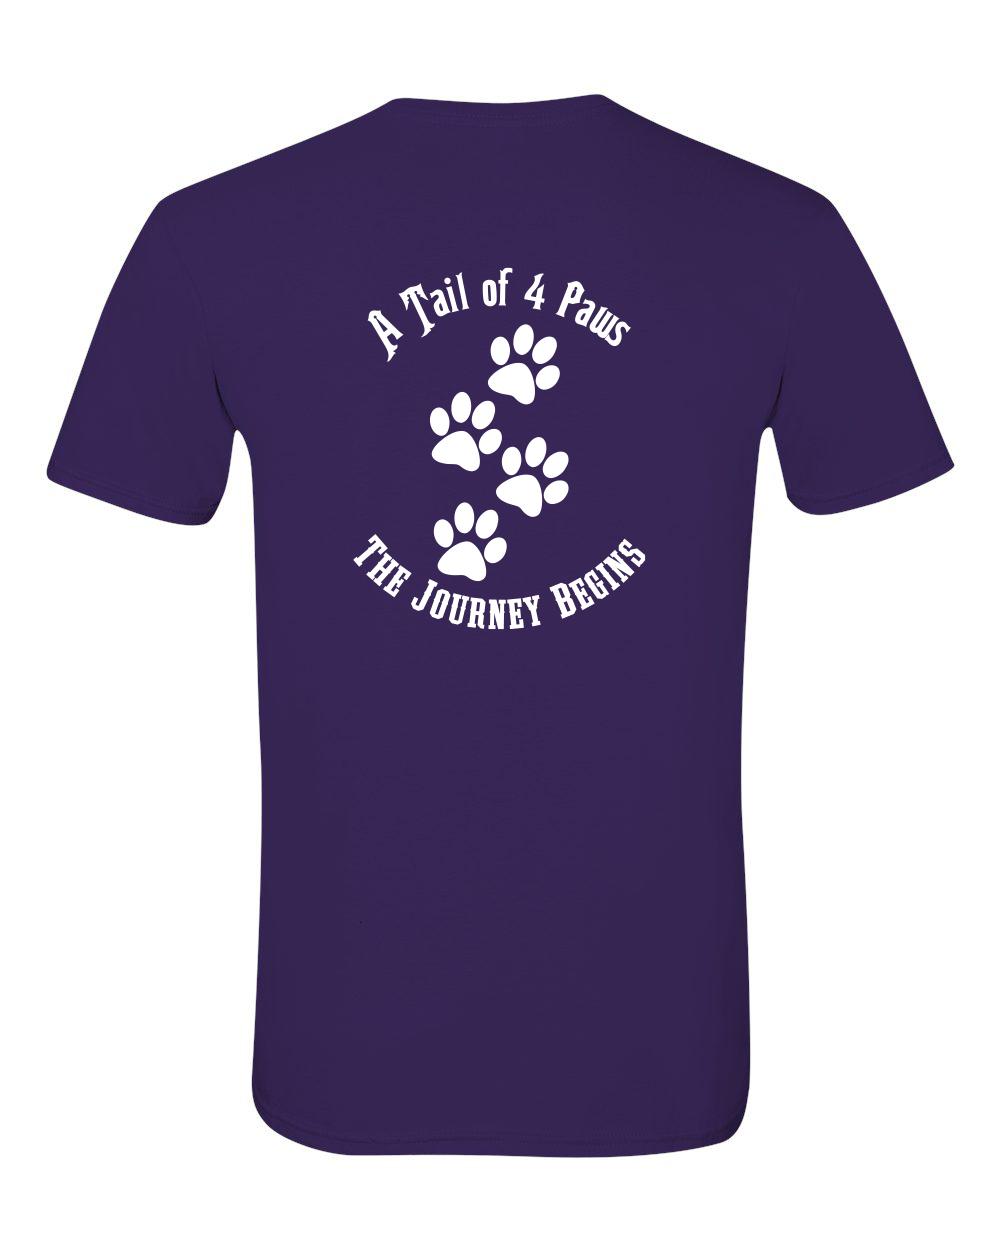 Back of Shirt Purple